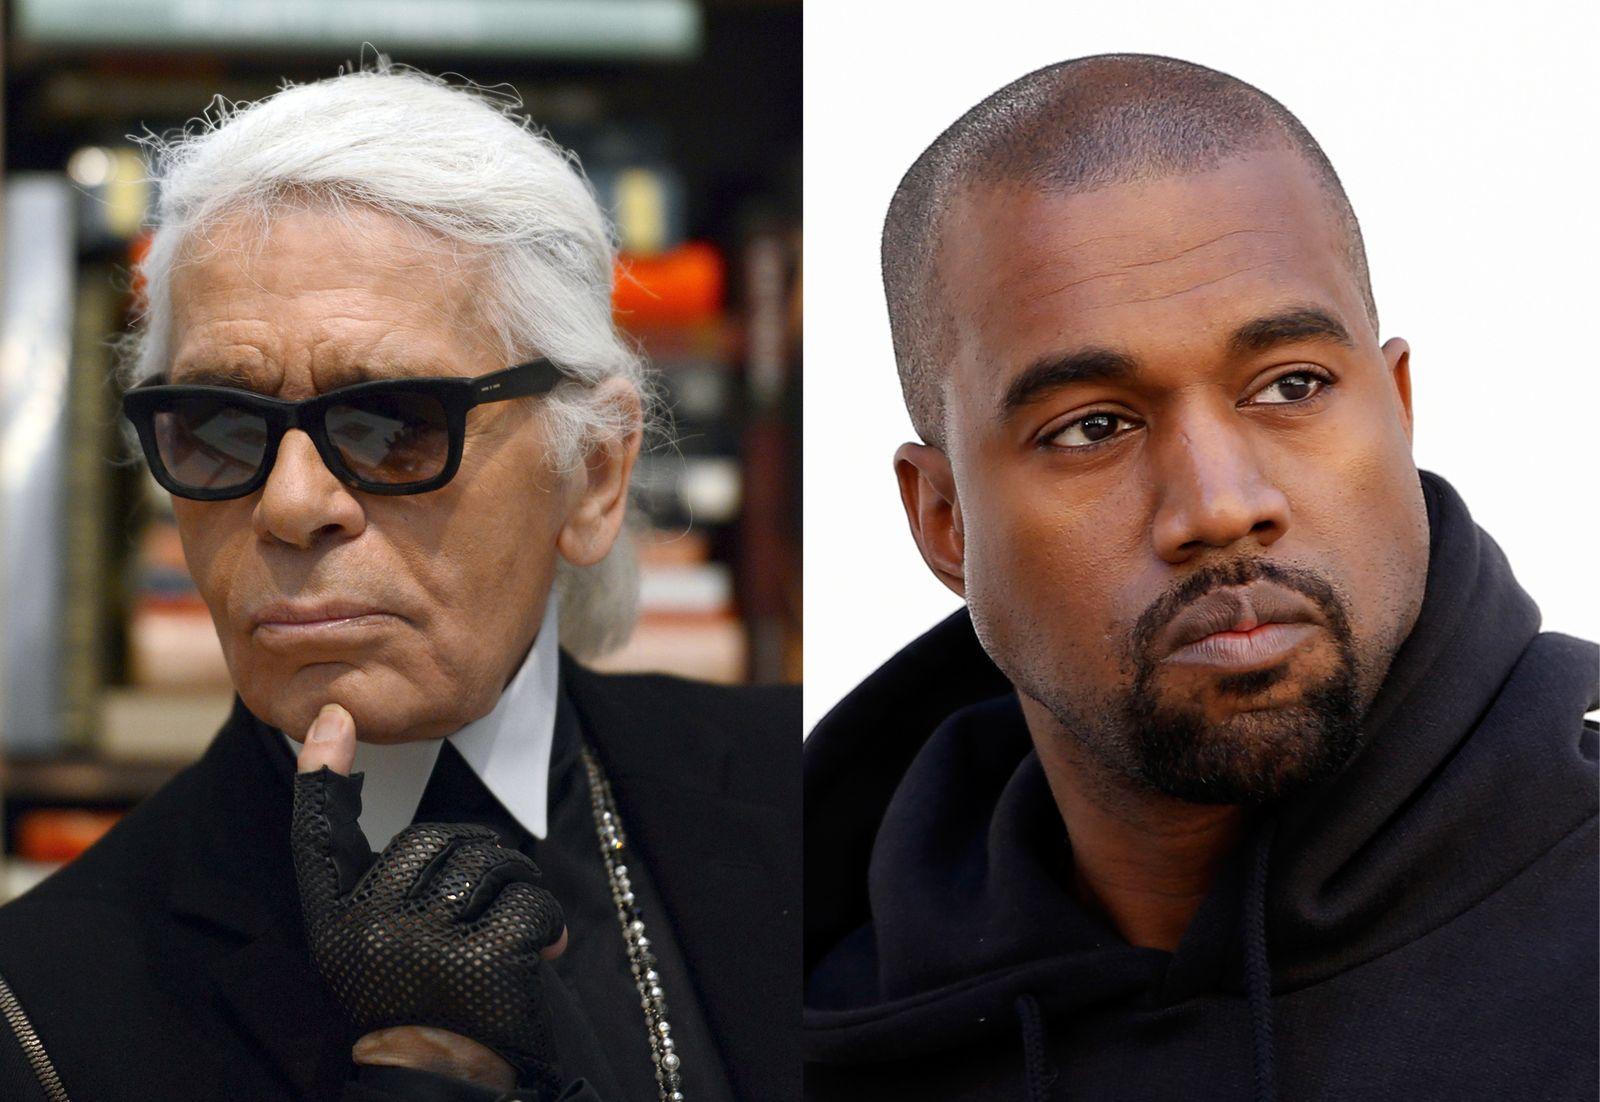 Karl Lagerfeld/ Kanye West